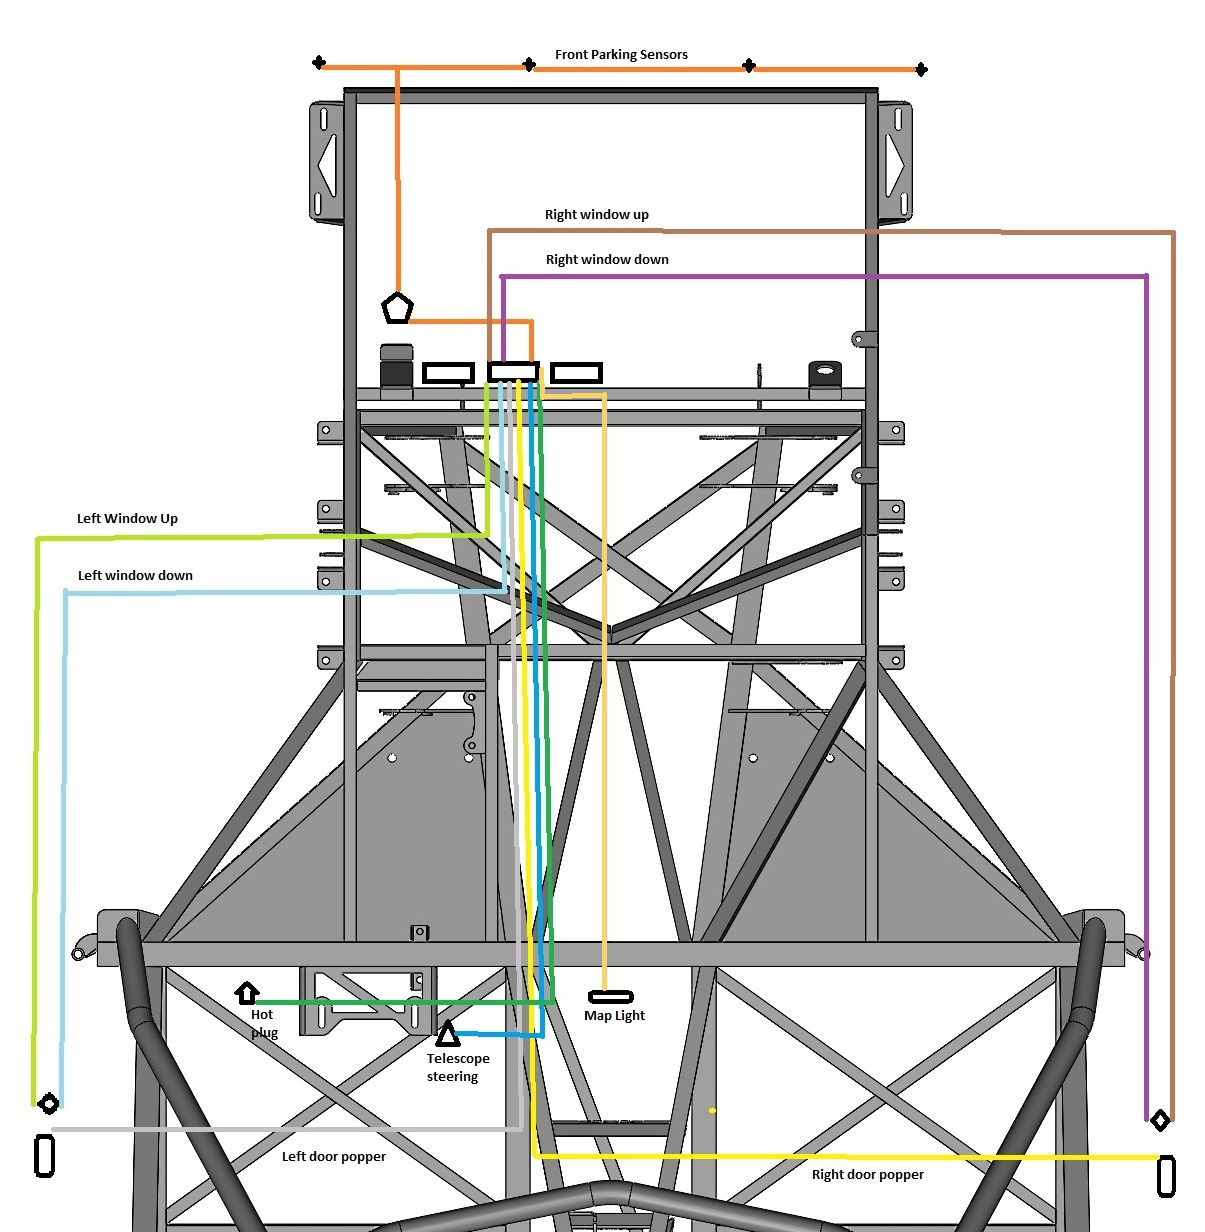 power cell 3 wiring fb super car build power door popper wiring diagram  [ 1205 x 1232 Pixel ]